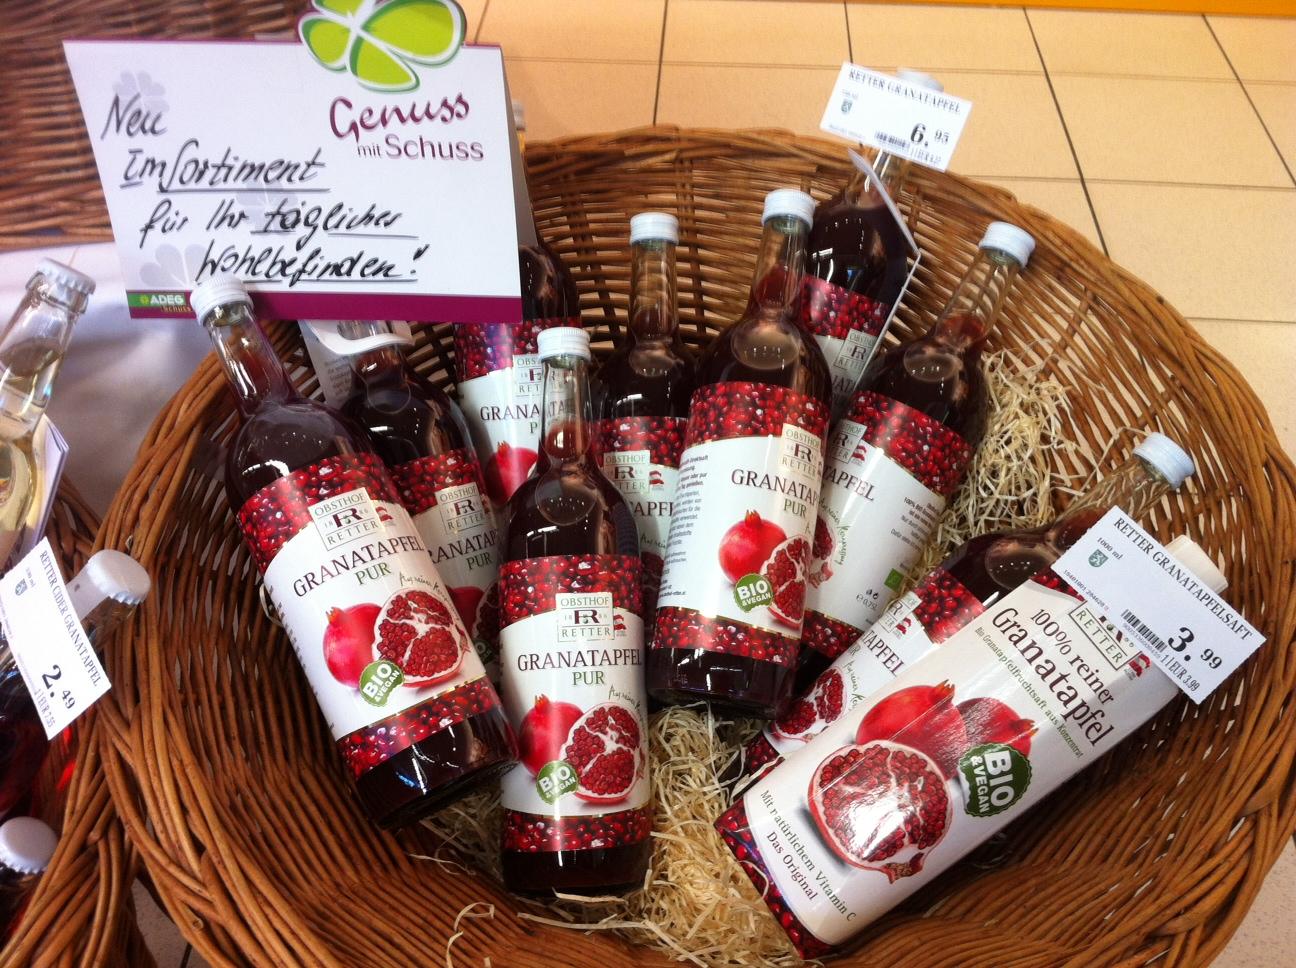 Granatapfel enthält wertvolle antioxidative Stoffe